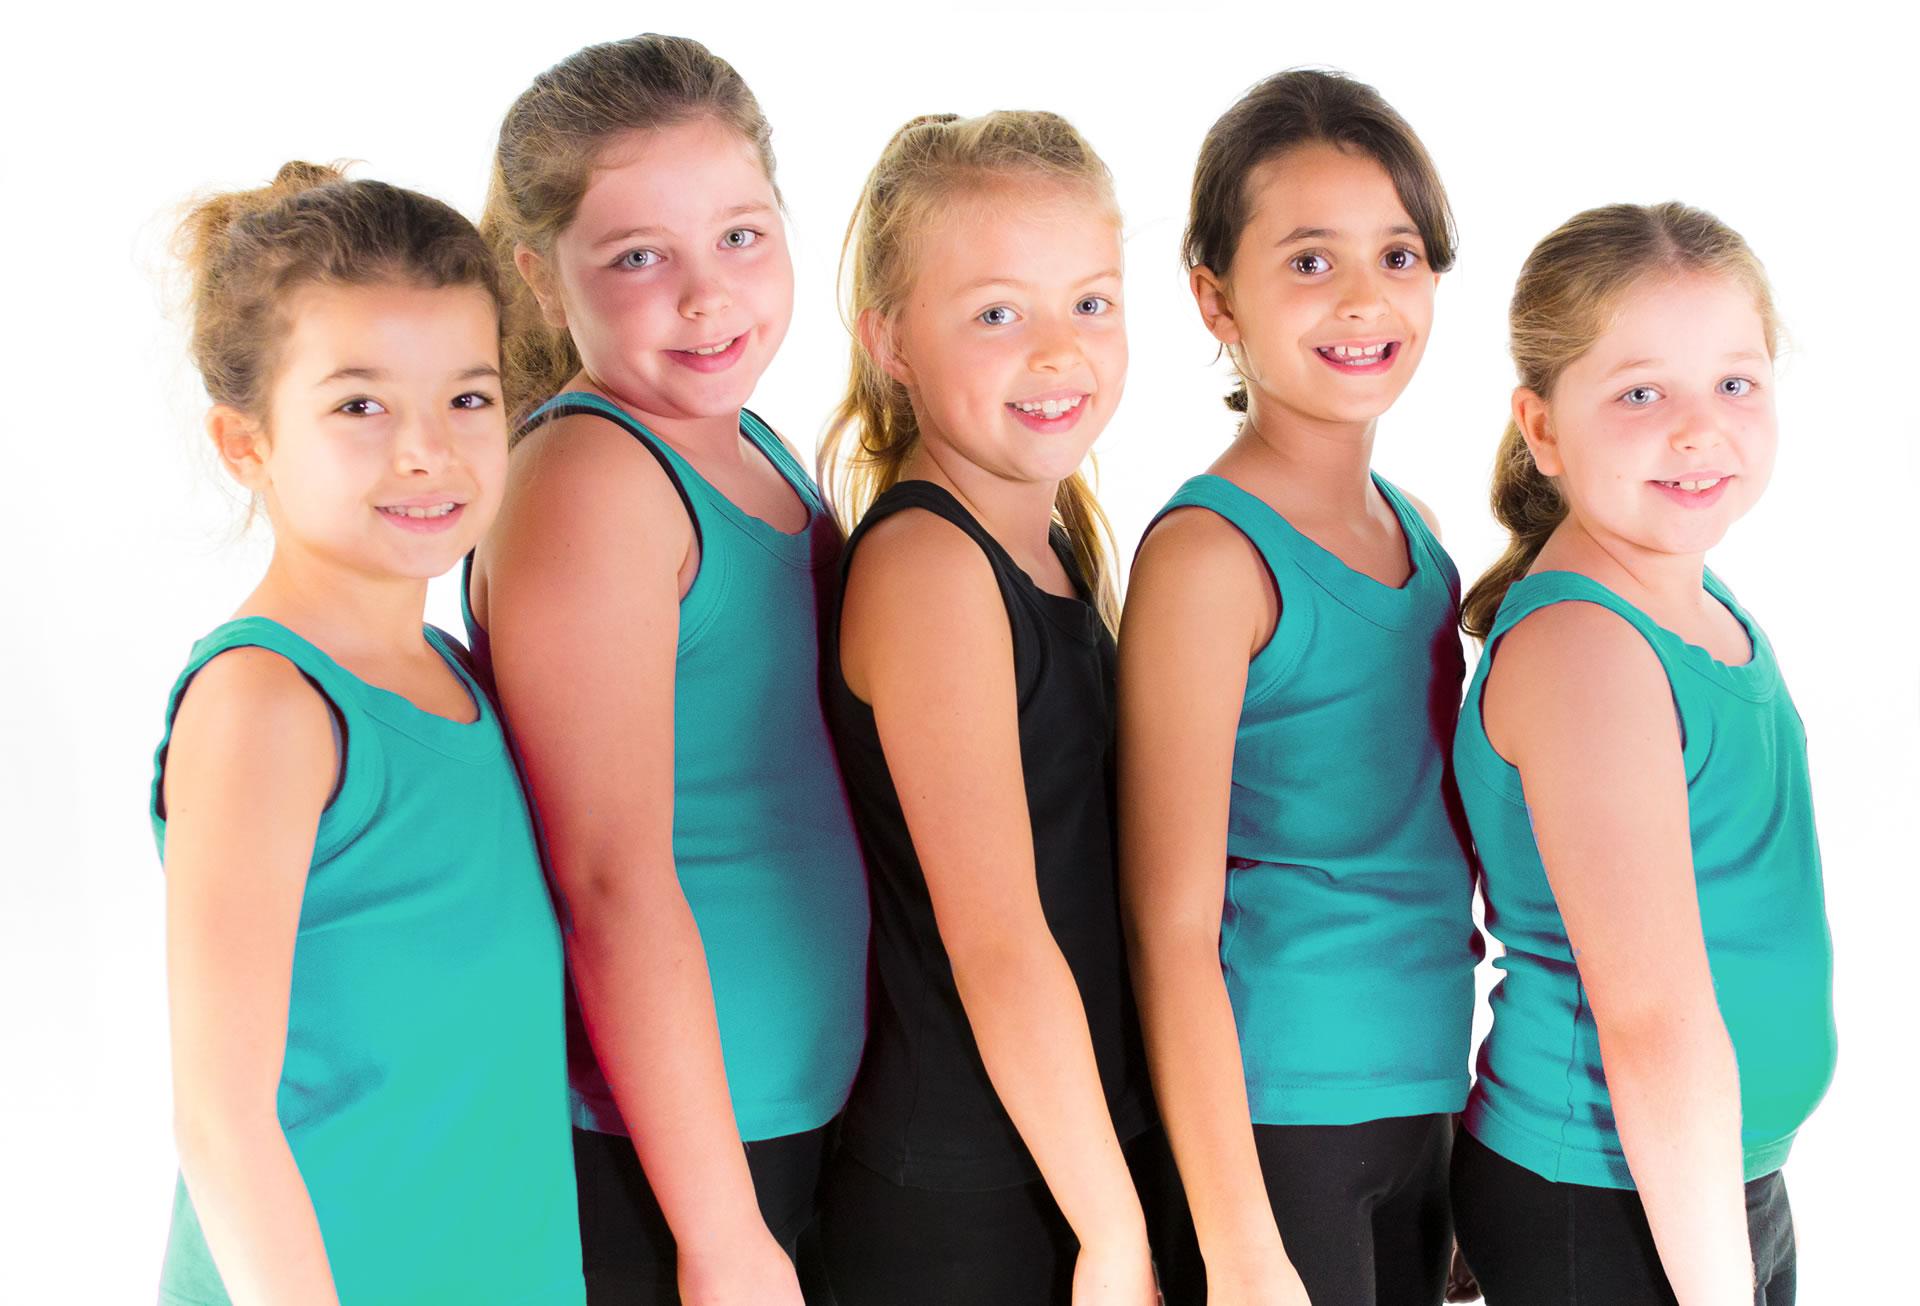 5 Girls ready to dance at Studio N Dance